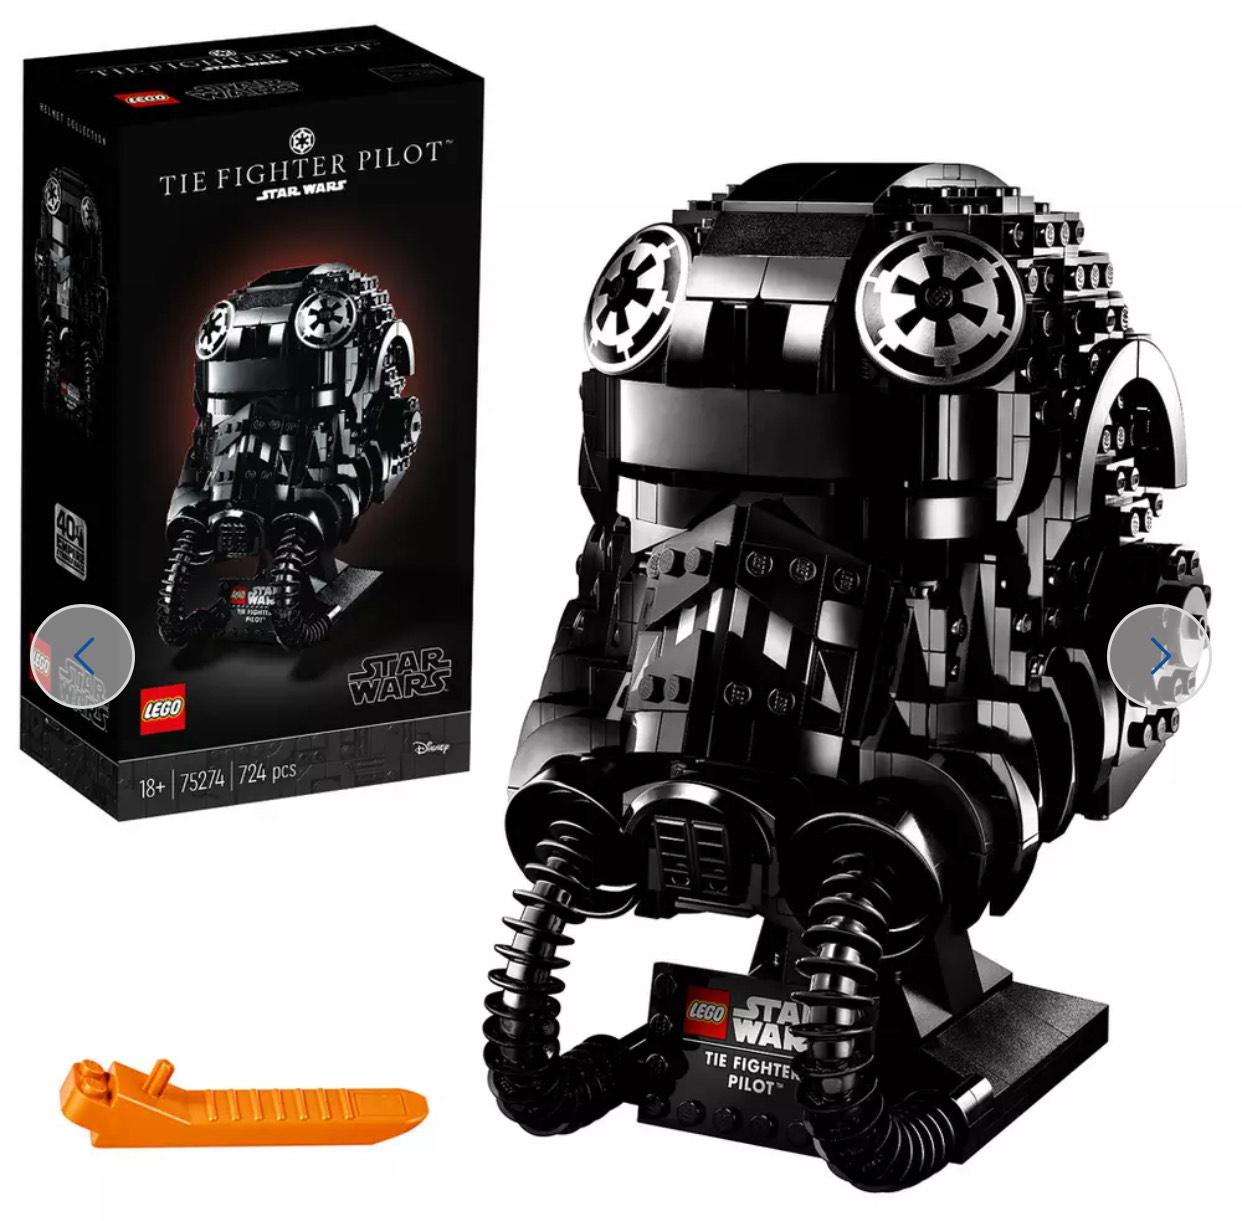 LEGO Star Wars 75274 TIE Fighter Pilot Helmet Display Set - £45 Free Click & Collect at Argos